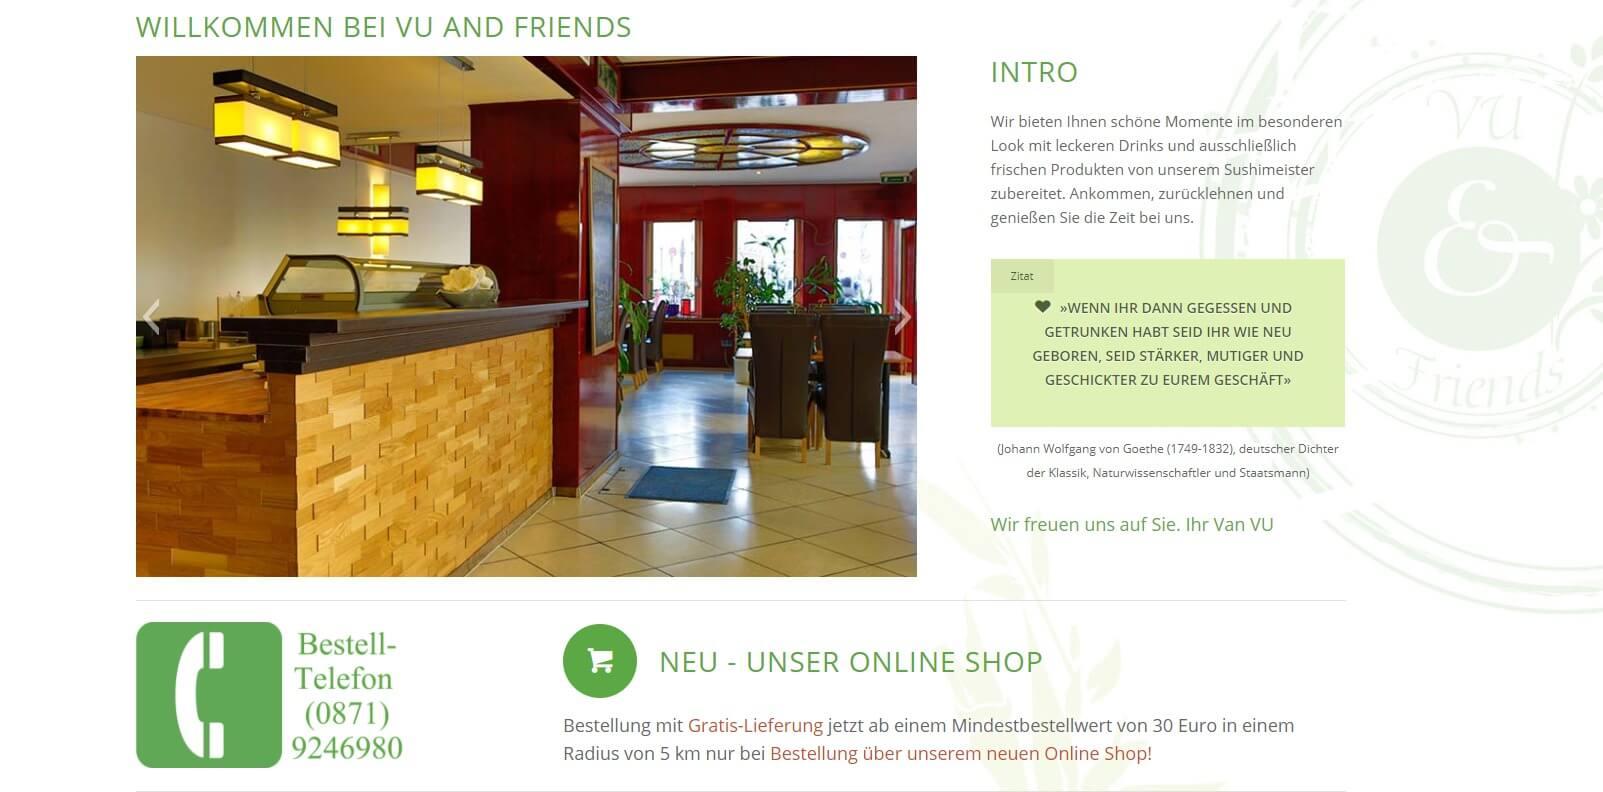 Image of VU & Friends in Landshut